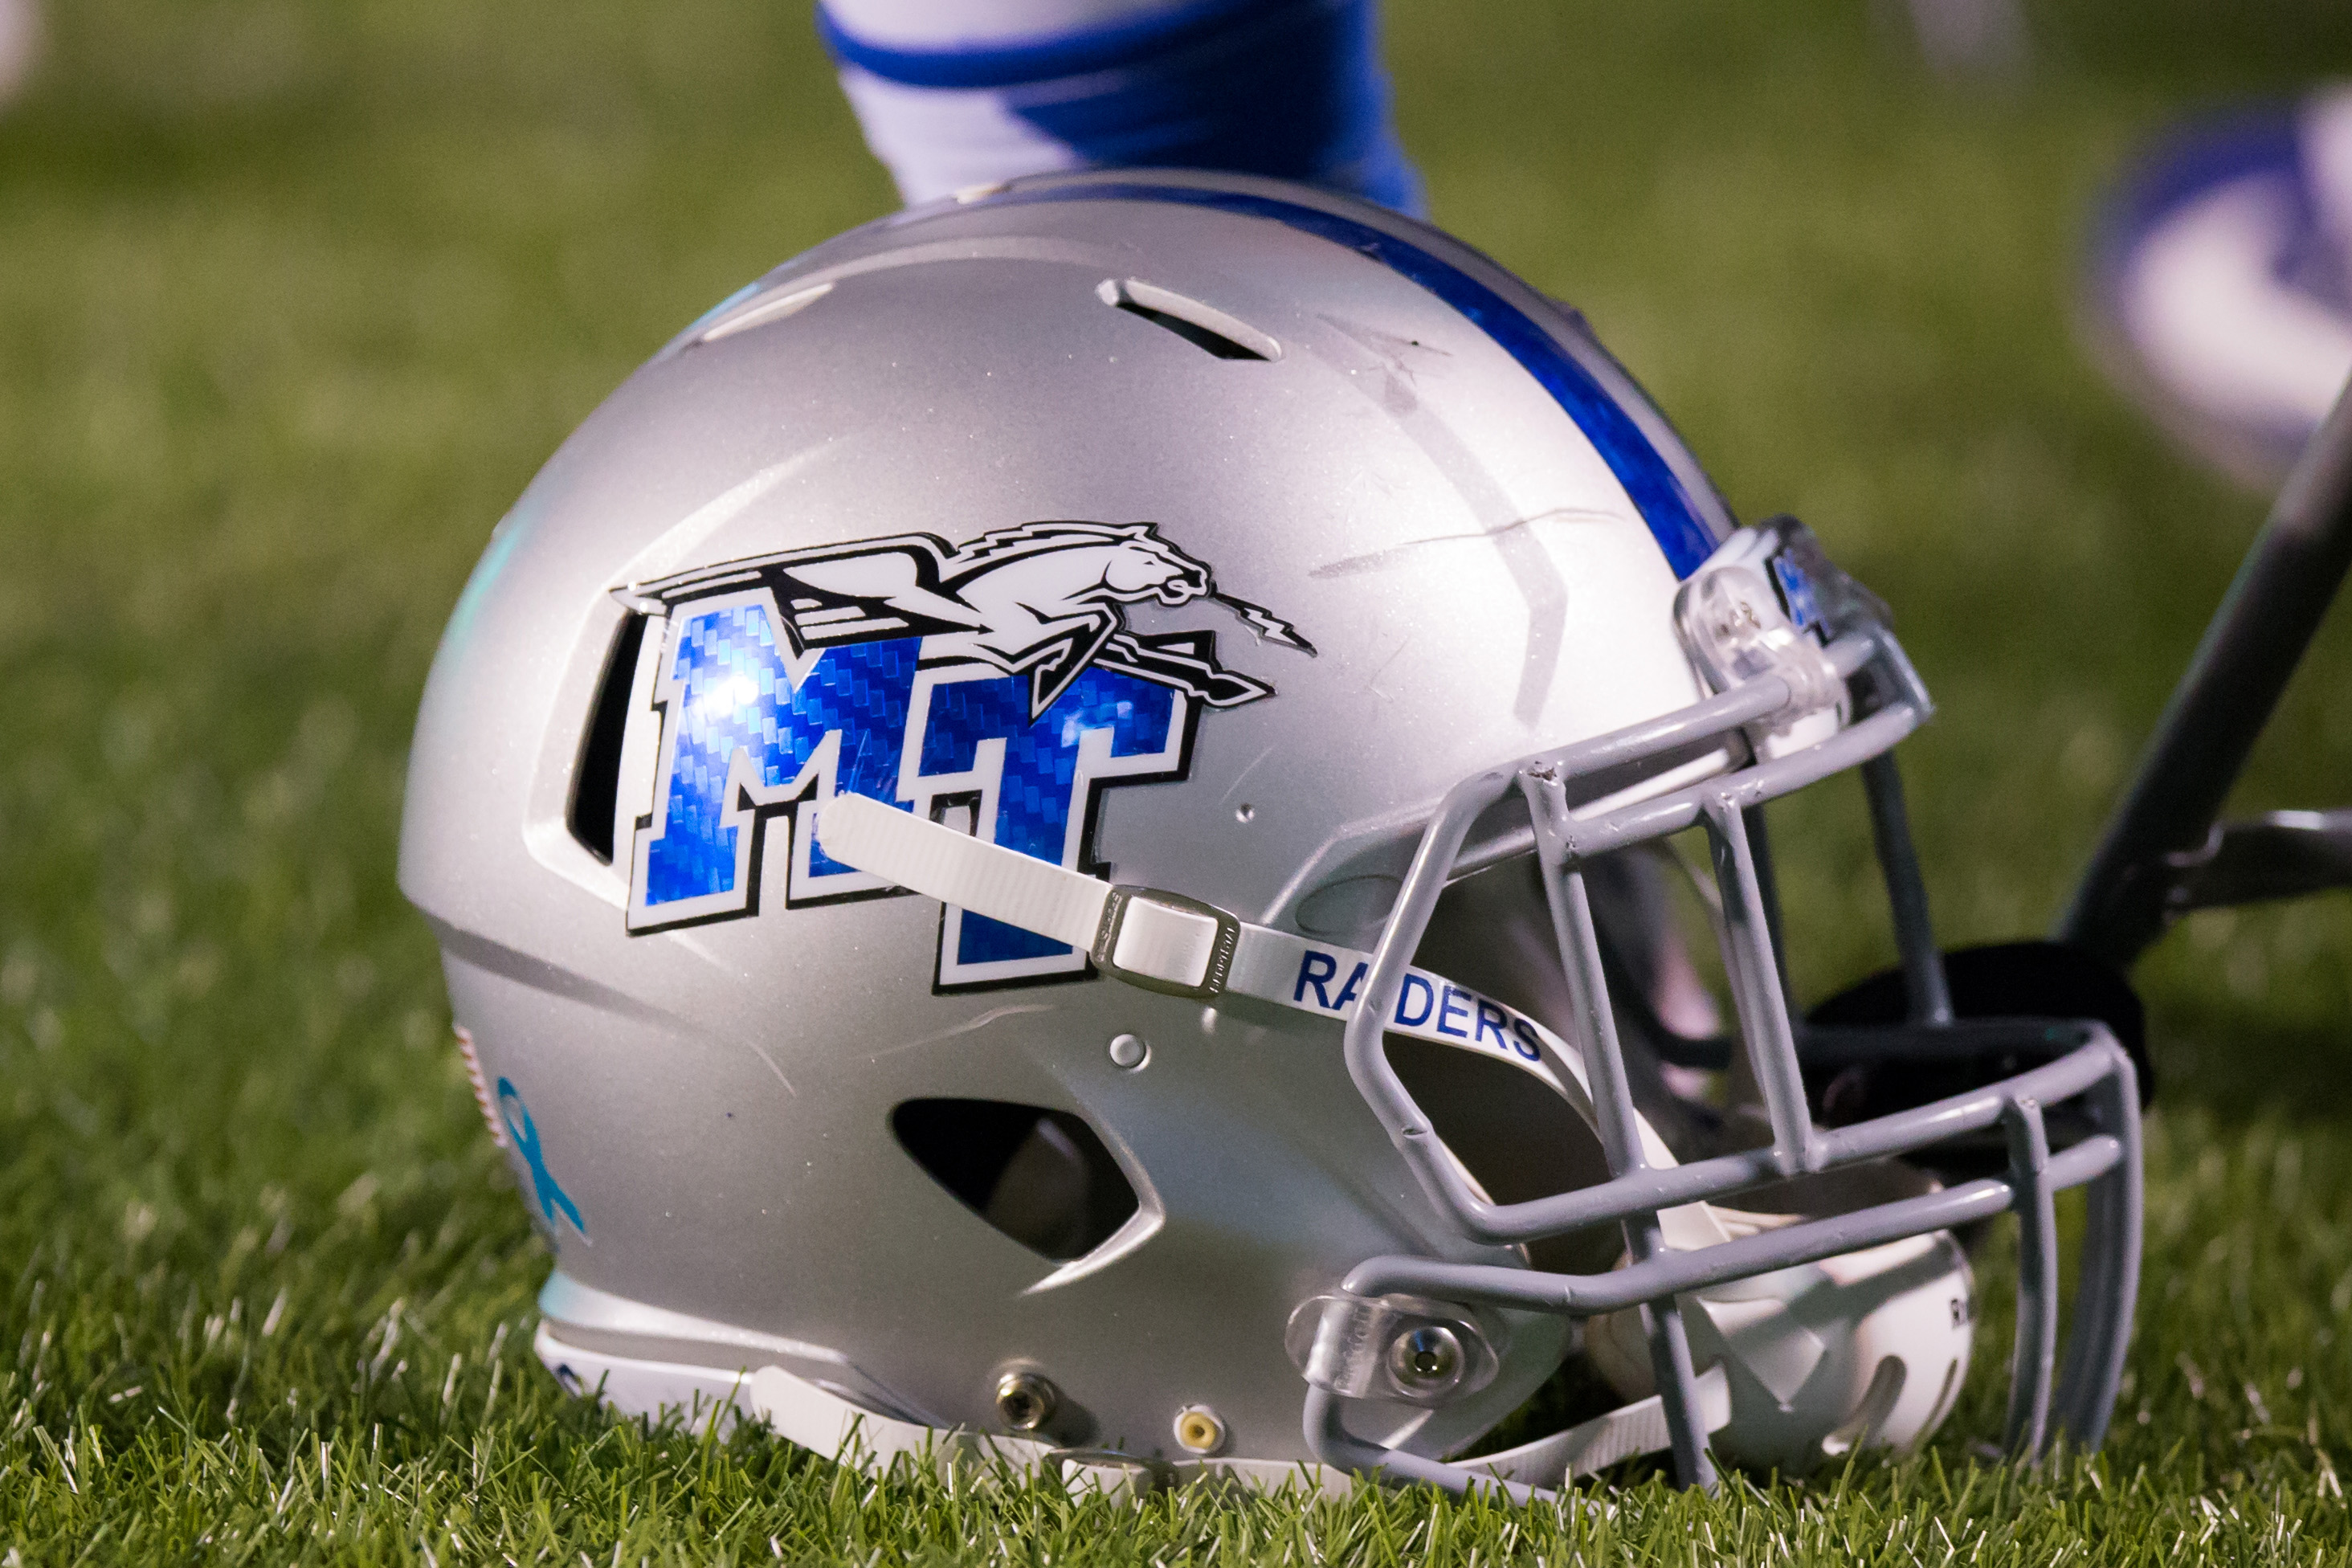 NCAA FOOTBALL: NOV 12 Middle Tennessee at Marshall